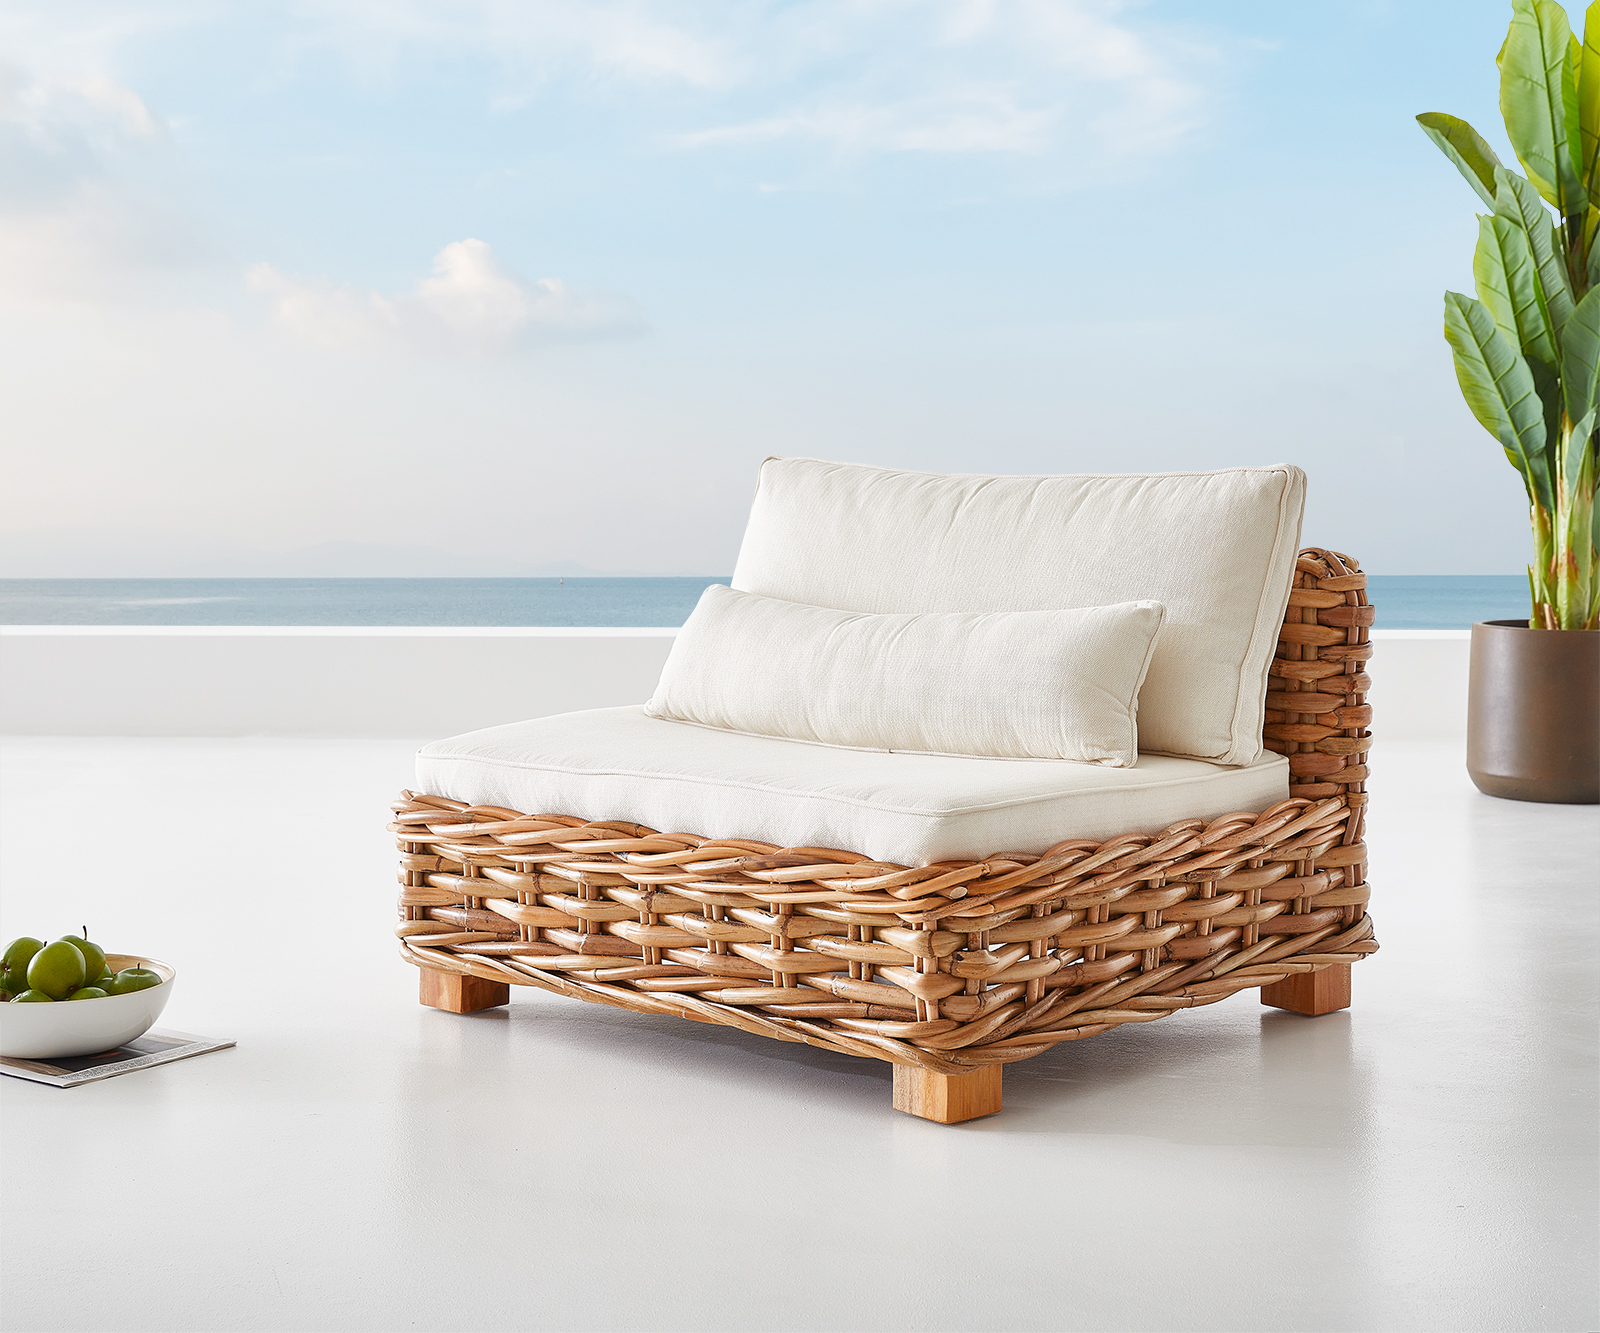 Outdoorsessel Nizza 105x95 cm Rattan natur Kissen weiß handgefertigt Loungesessel